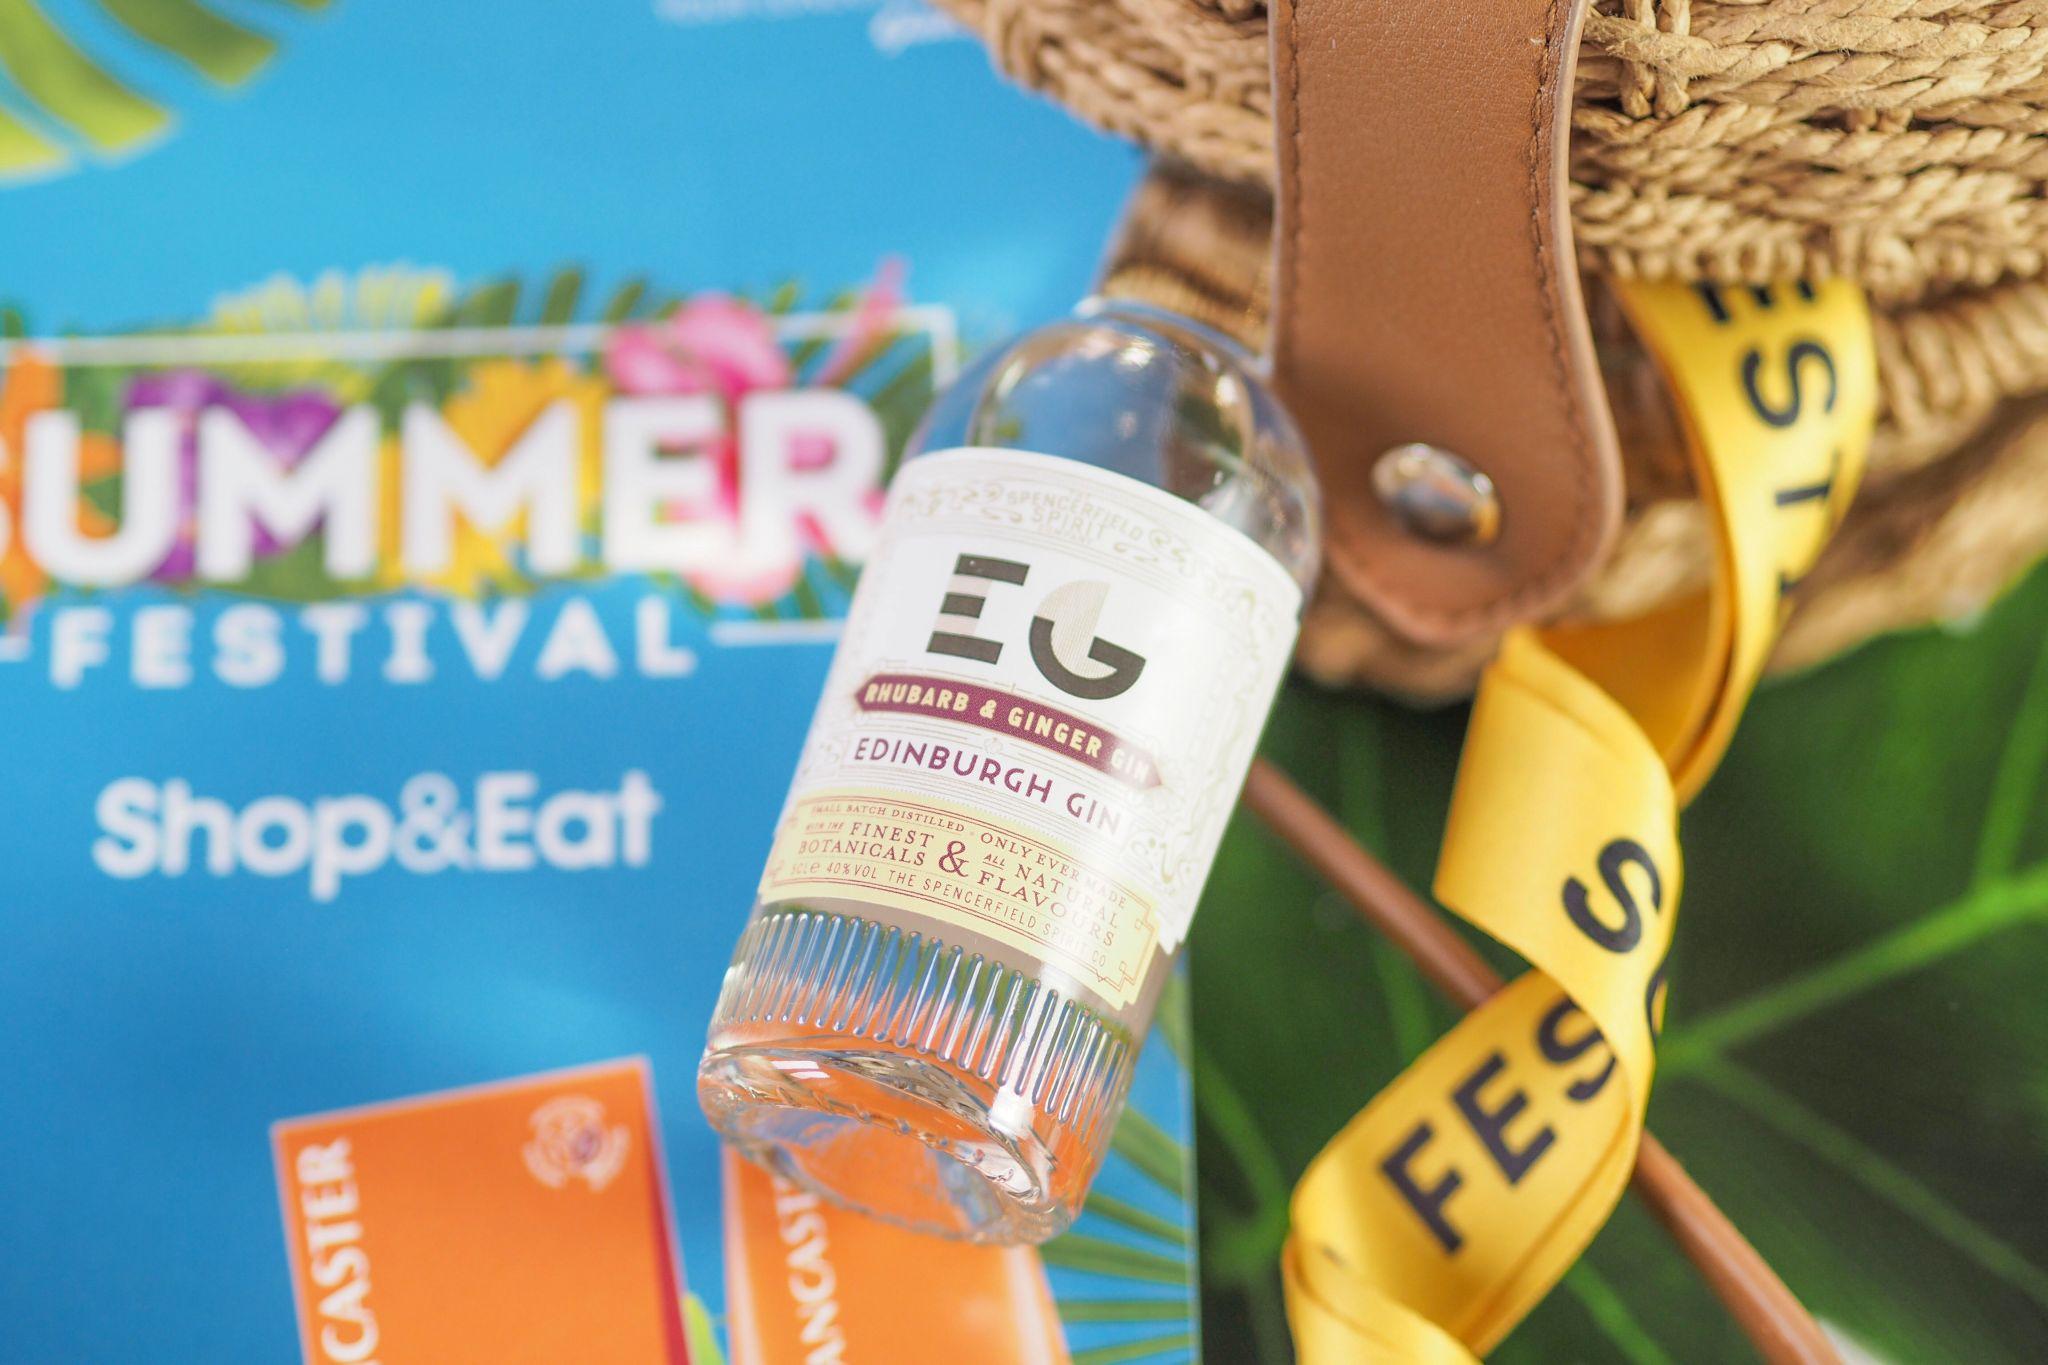 Edinburgh Gin Rhubarb & Ginger from Gatwick Summer Festival